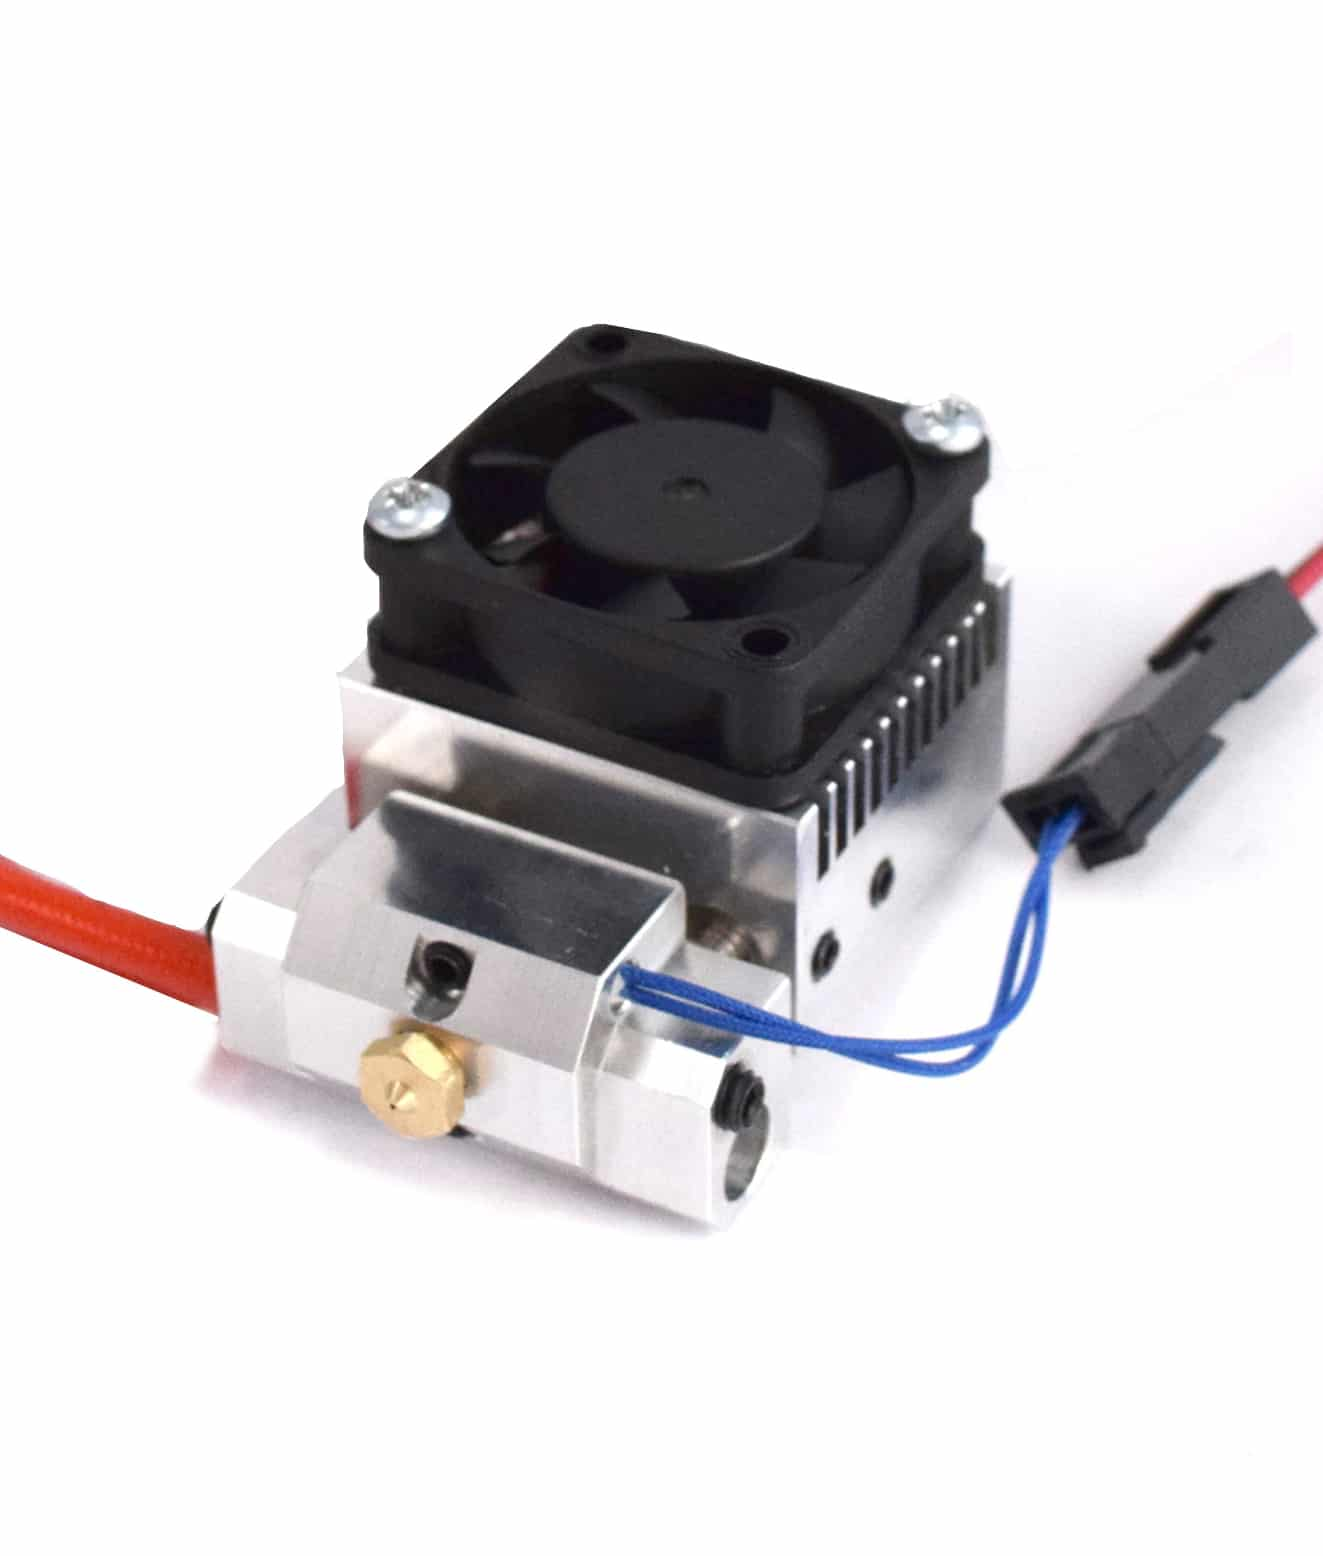 3D Printer parts for E3D Chimera E3D Cyclops Hotend Kit Dual Color Extruder